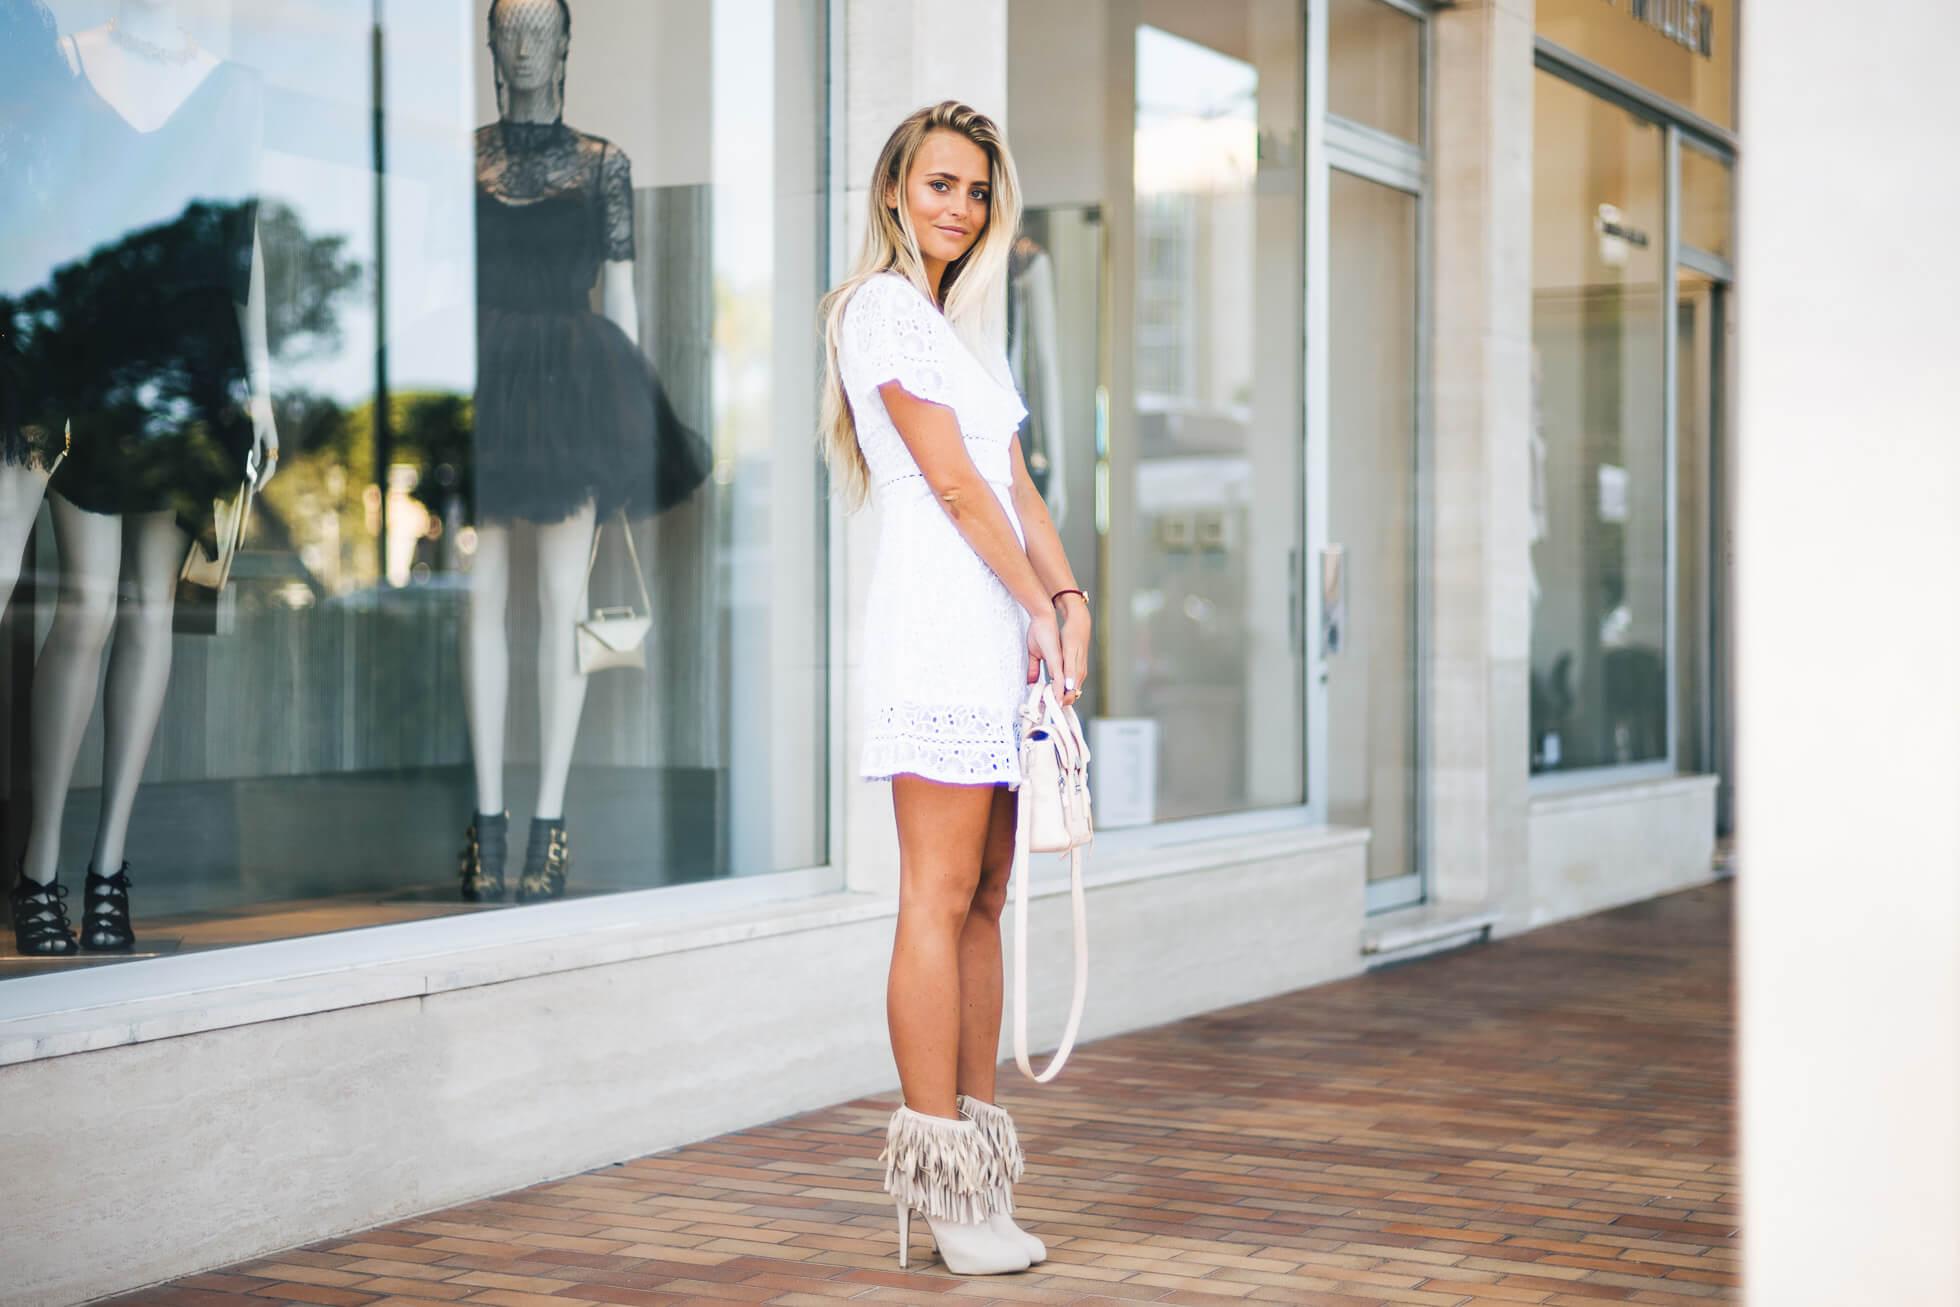 janni-deler-white-lace-dress-storetsJ1040082-Redigera